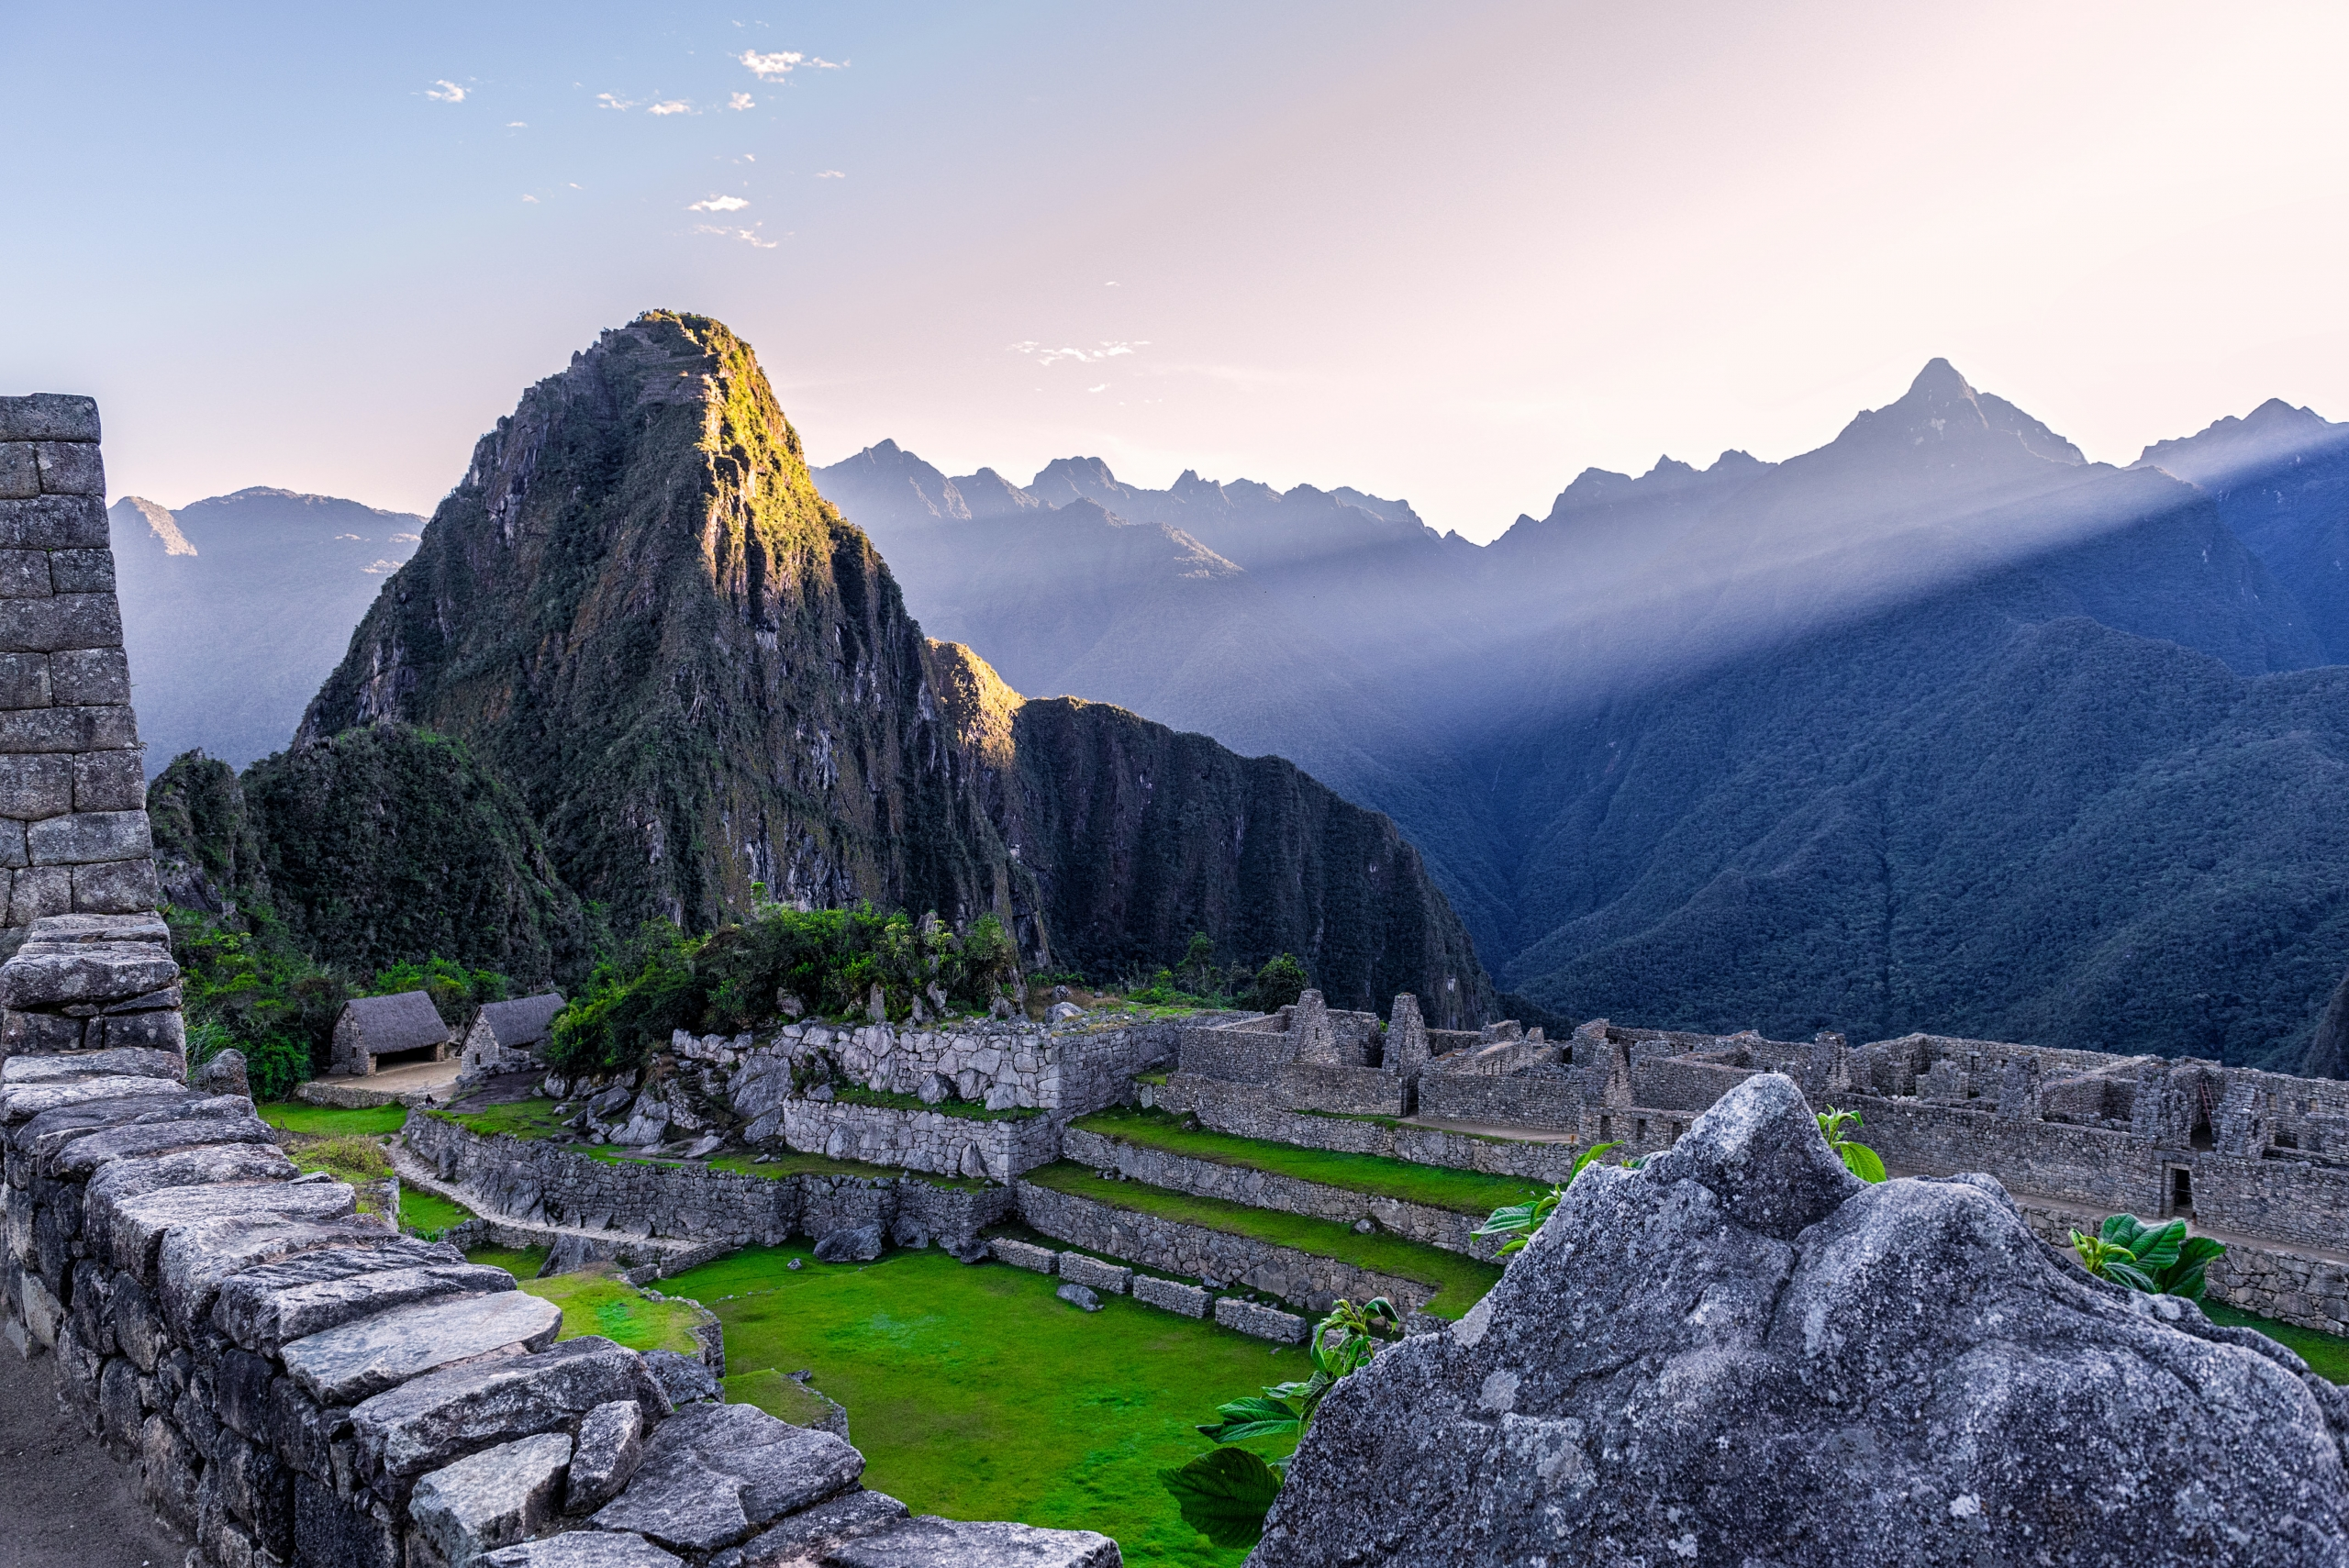 SynFiny Peru